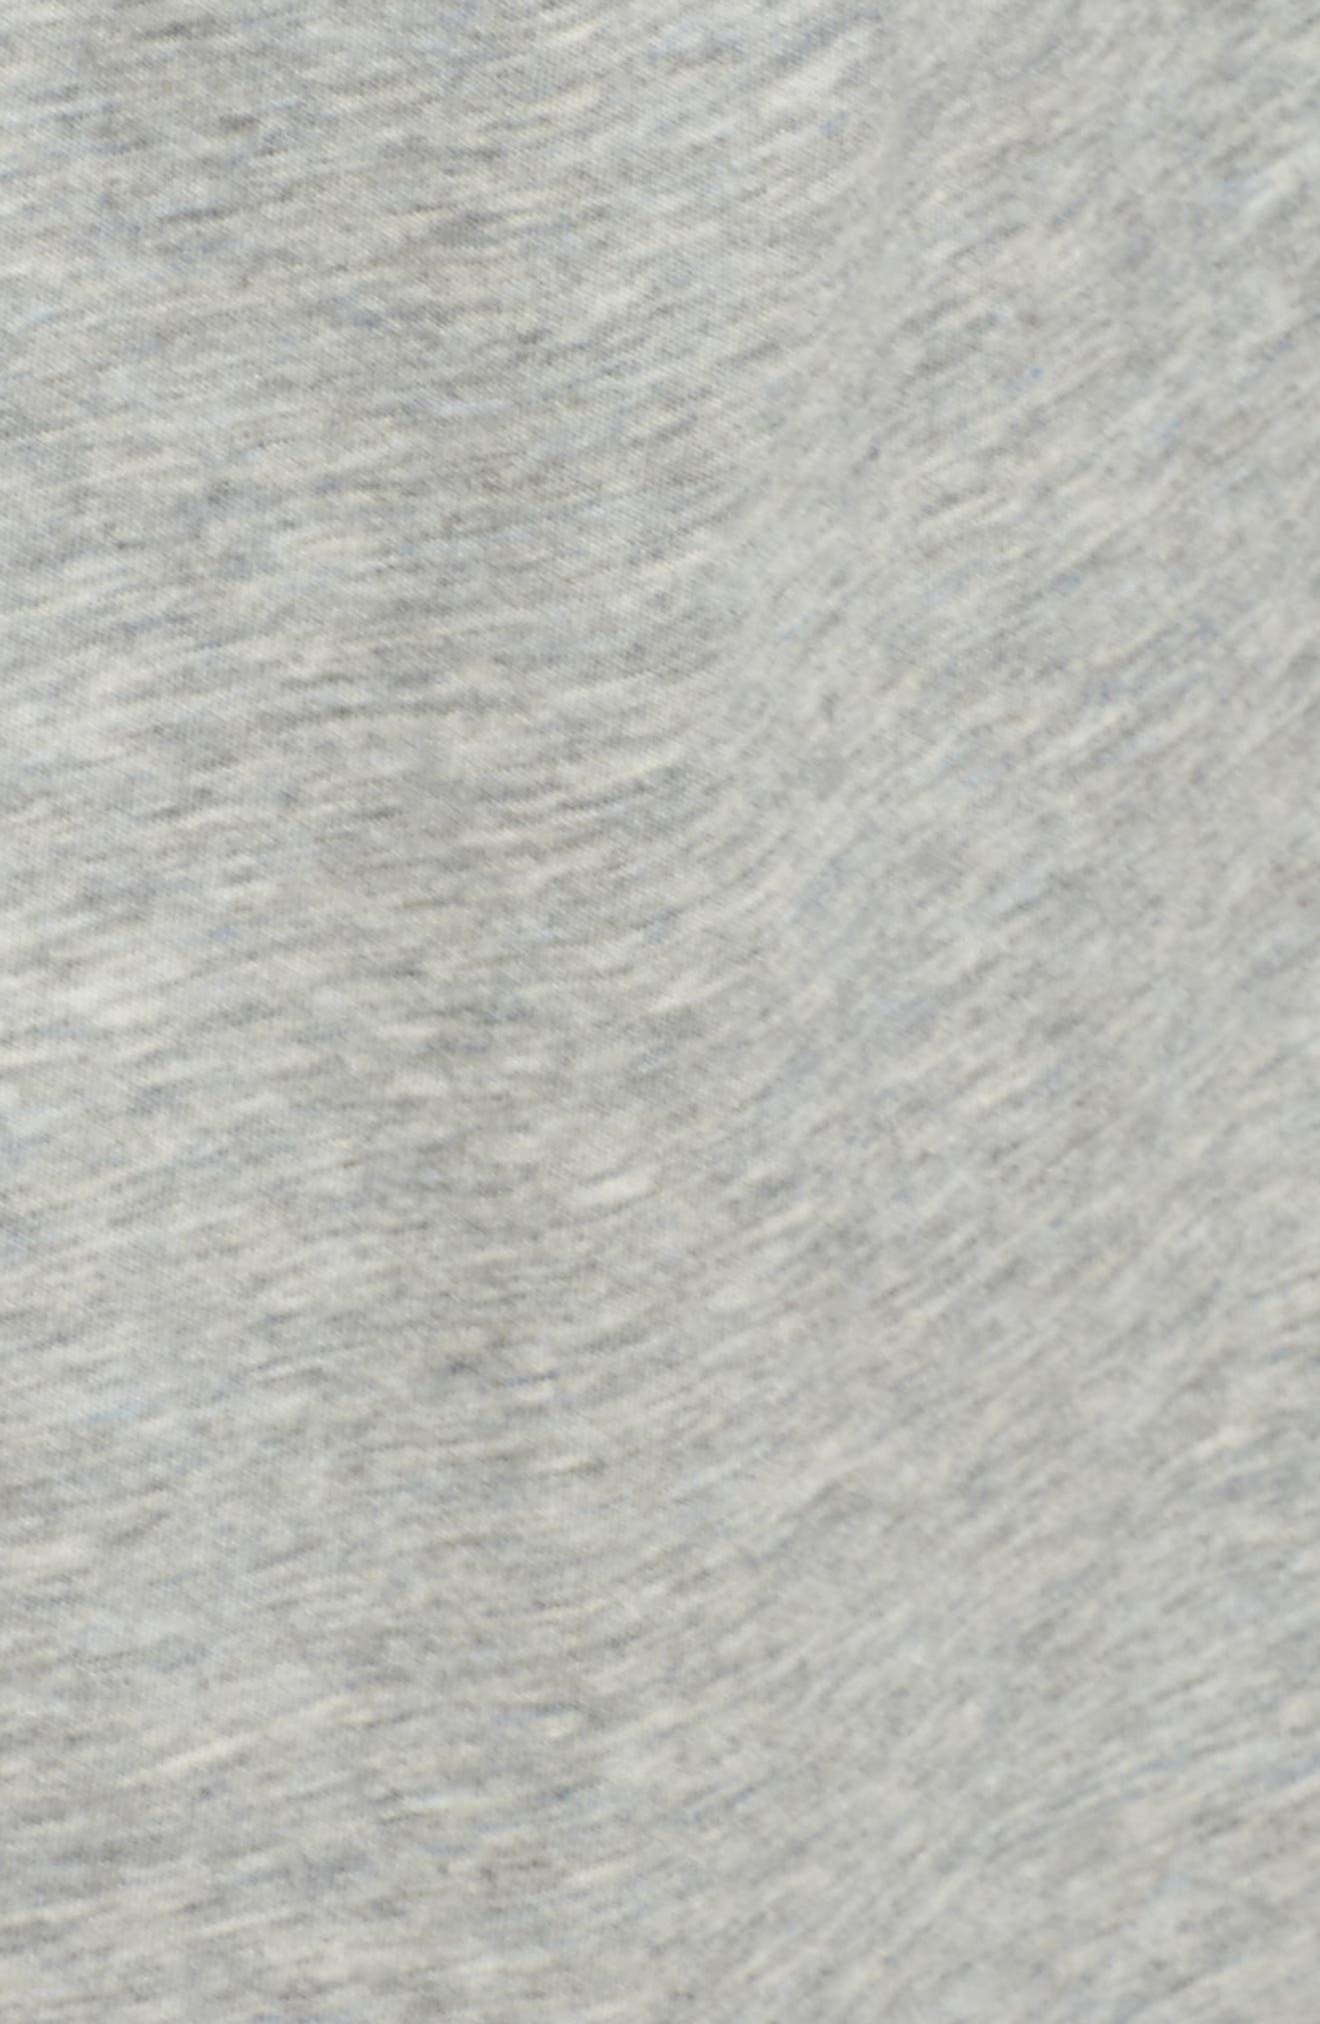 Coco Short Robe,                             Alternate thumbnail 5, color,                             020